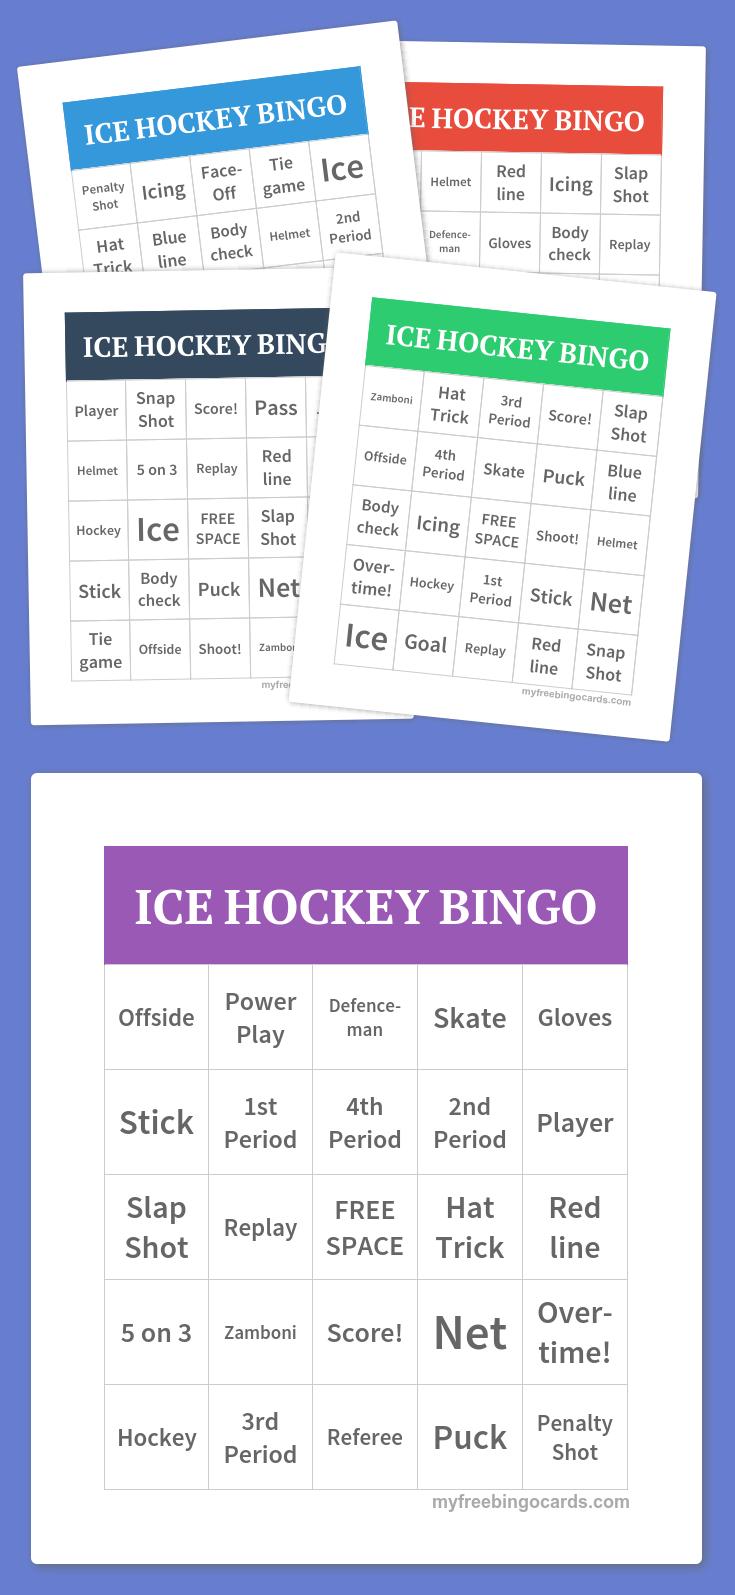 Ice Hockey Bingo | Free Bingo Cards, Bingo Cards Printable